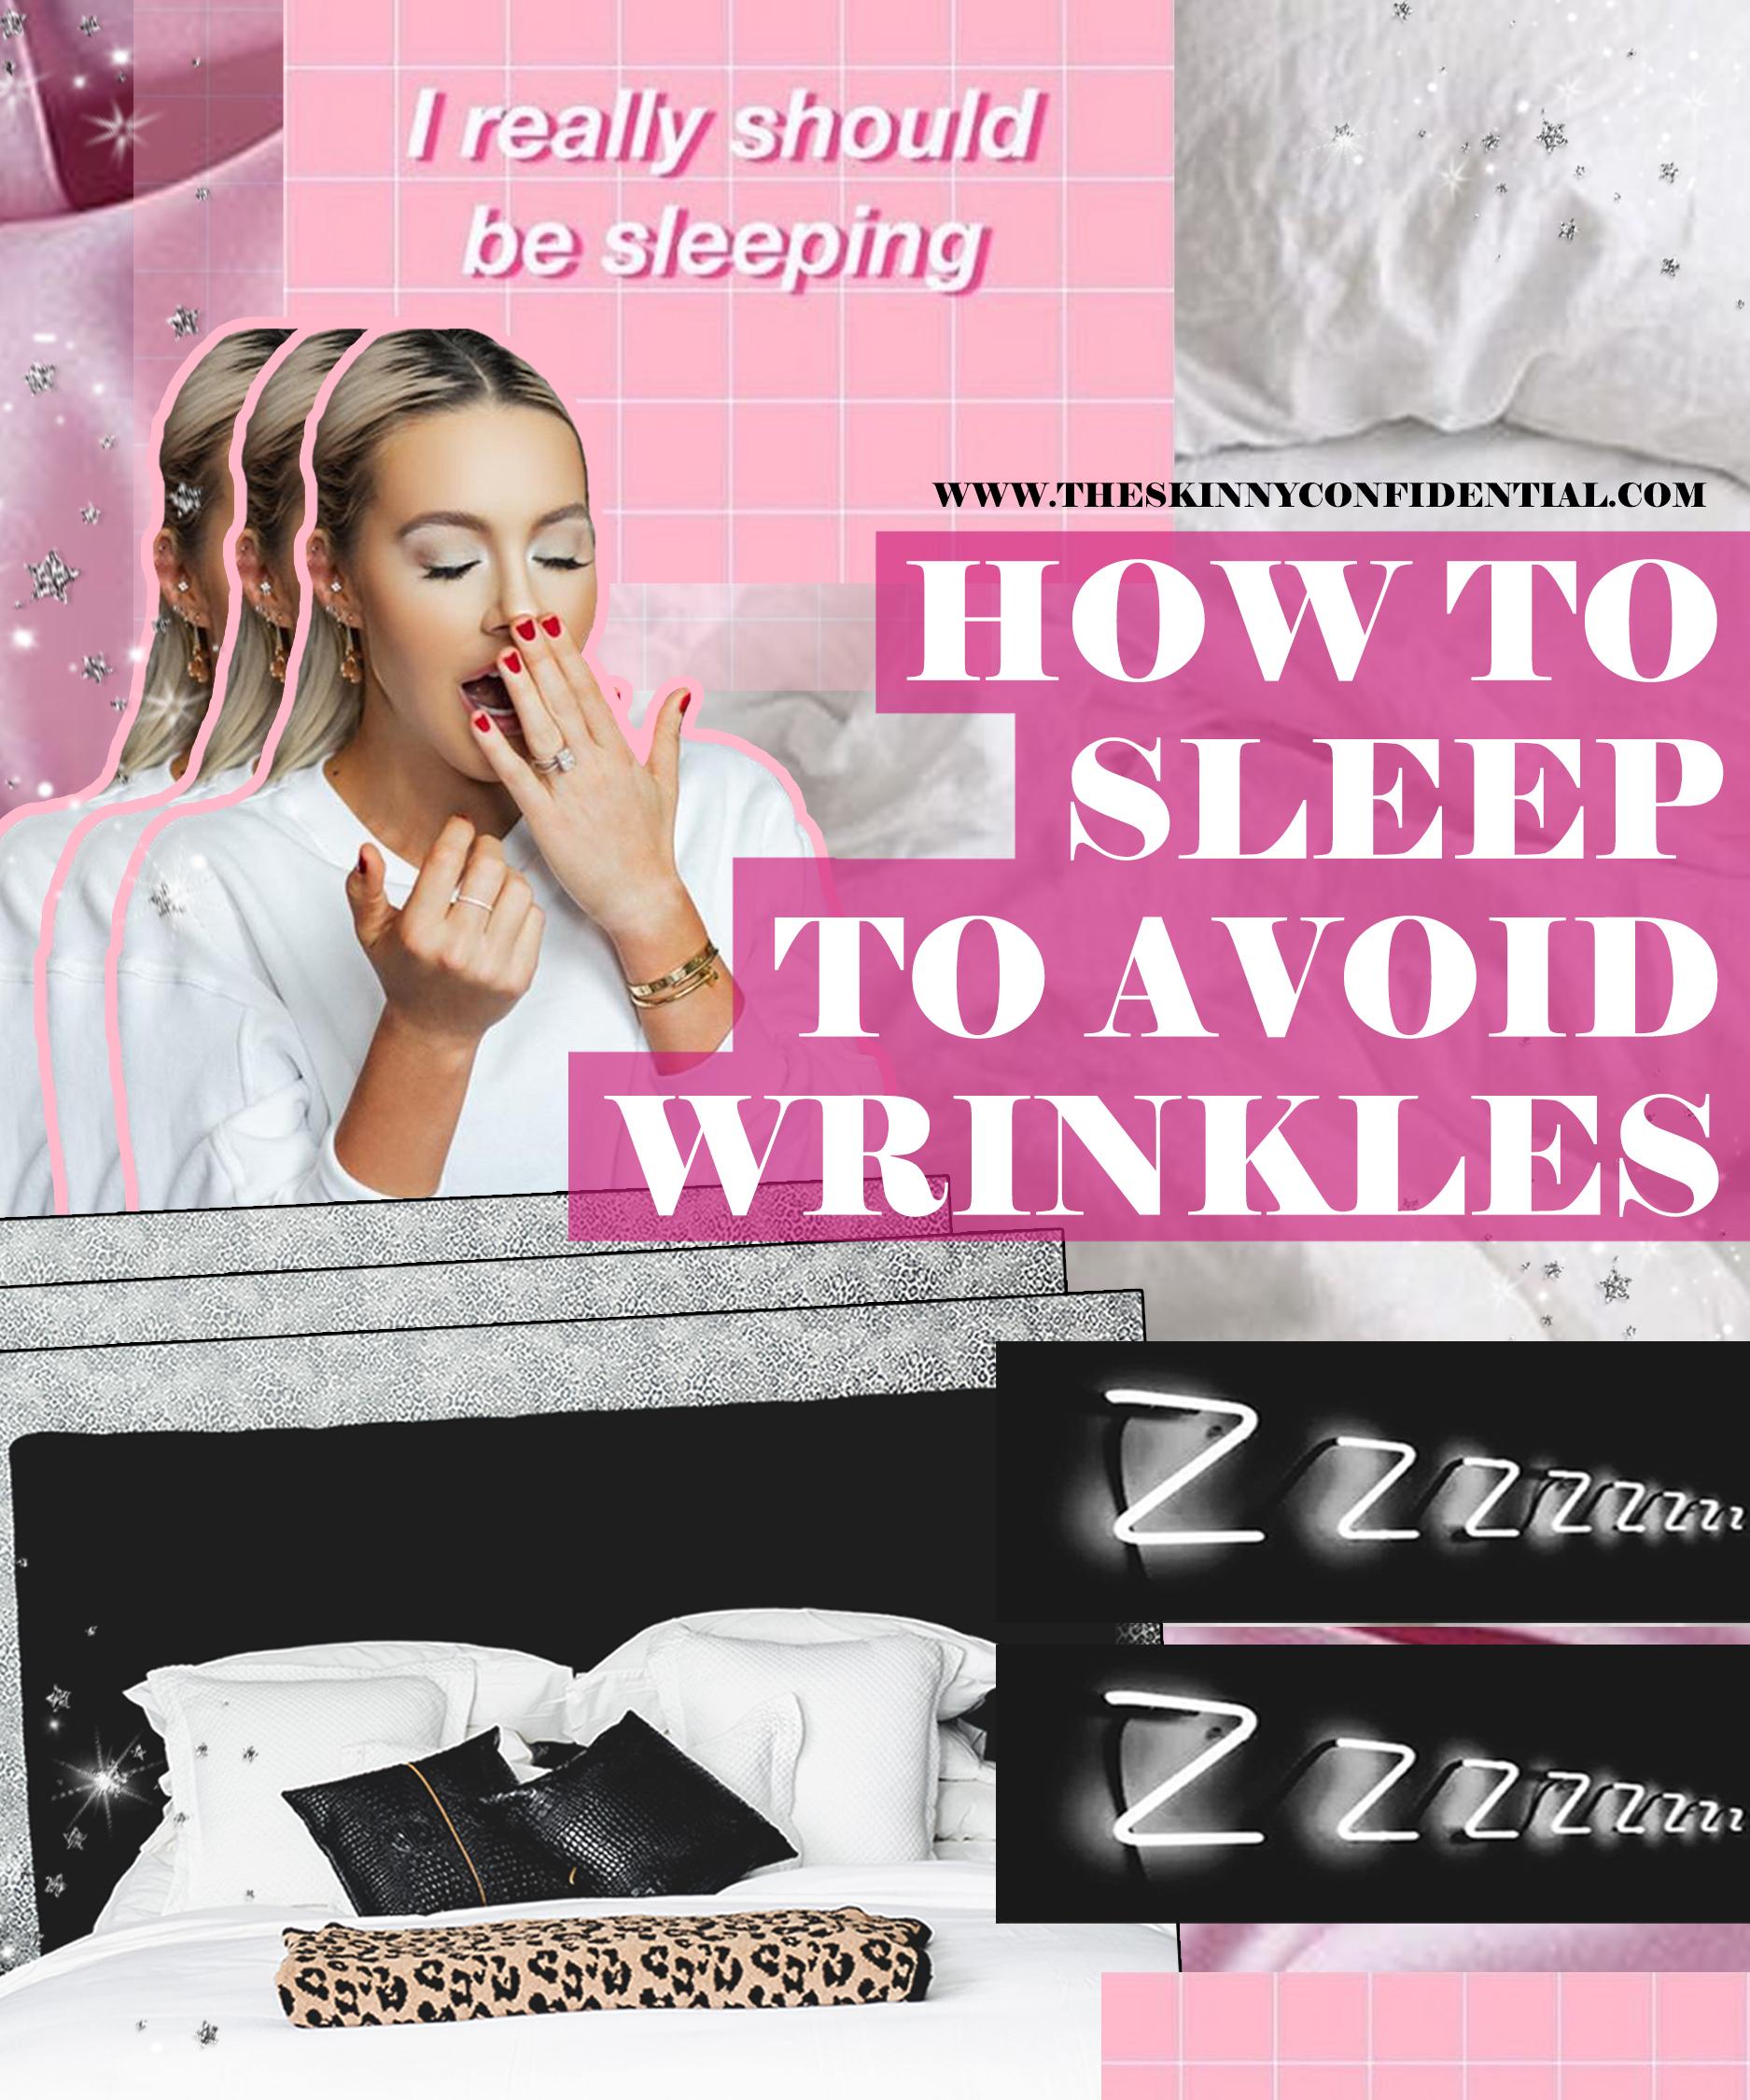 NEWSFLASH: Is The Way You Sleep Giving You Wrinkles? I've Got You Covered